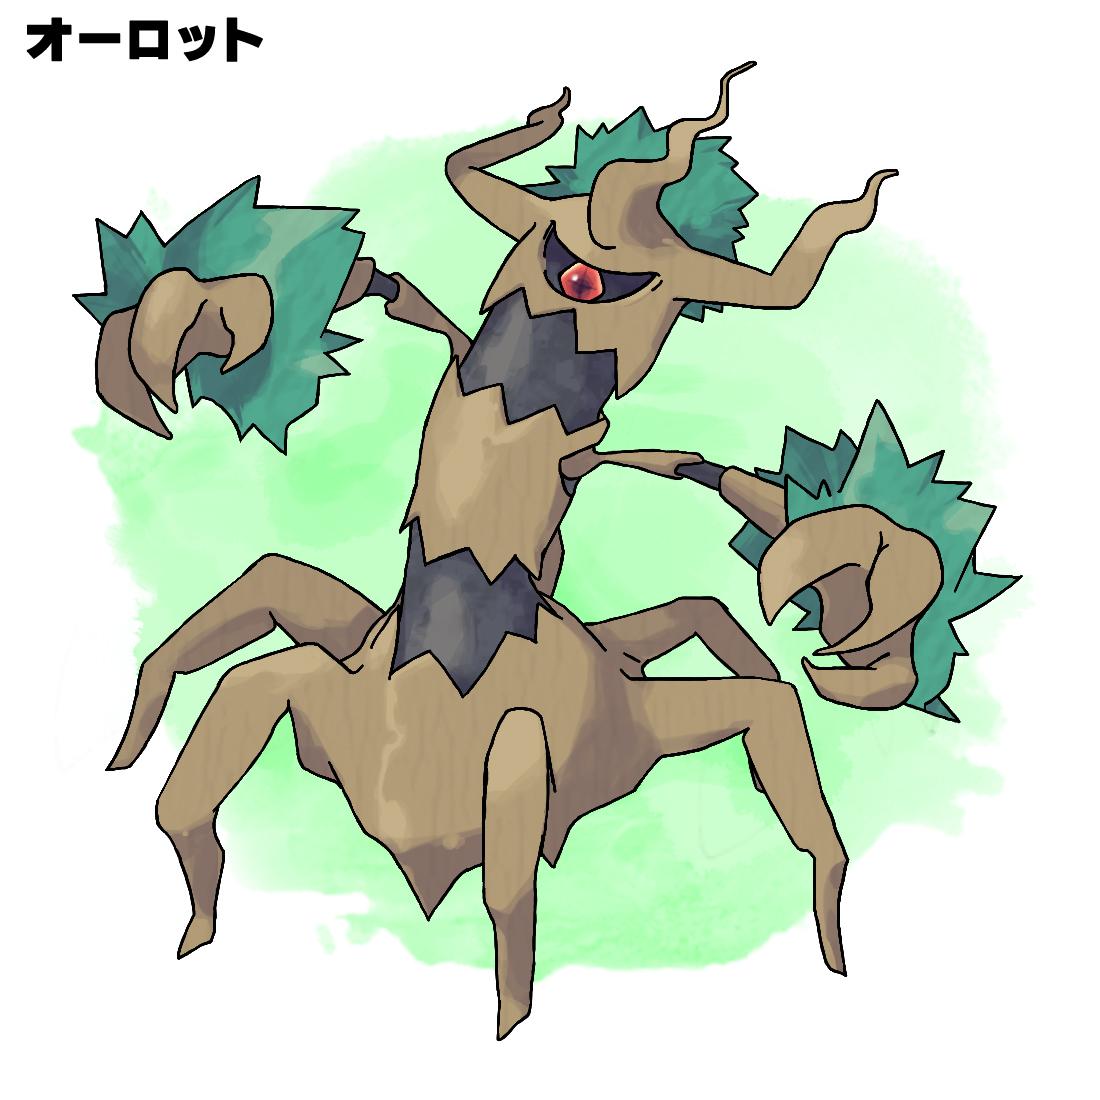 Trevenant - Pokémon - Image #1562878 - Zerochan Anime ...